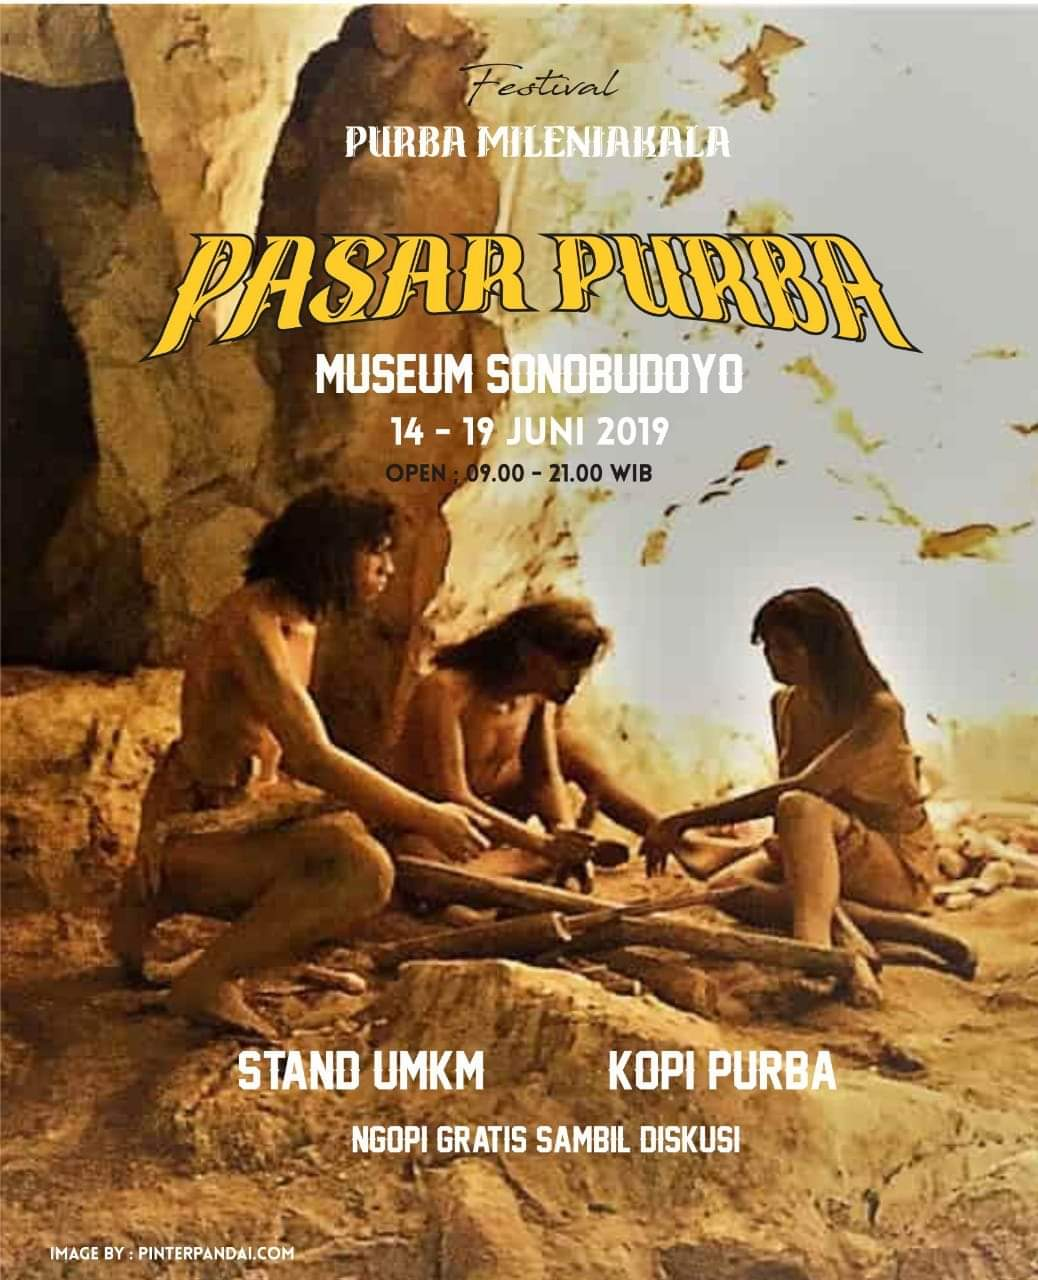 Festival Pasar Purba